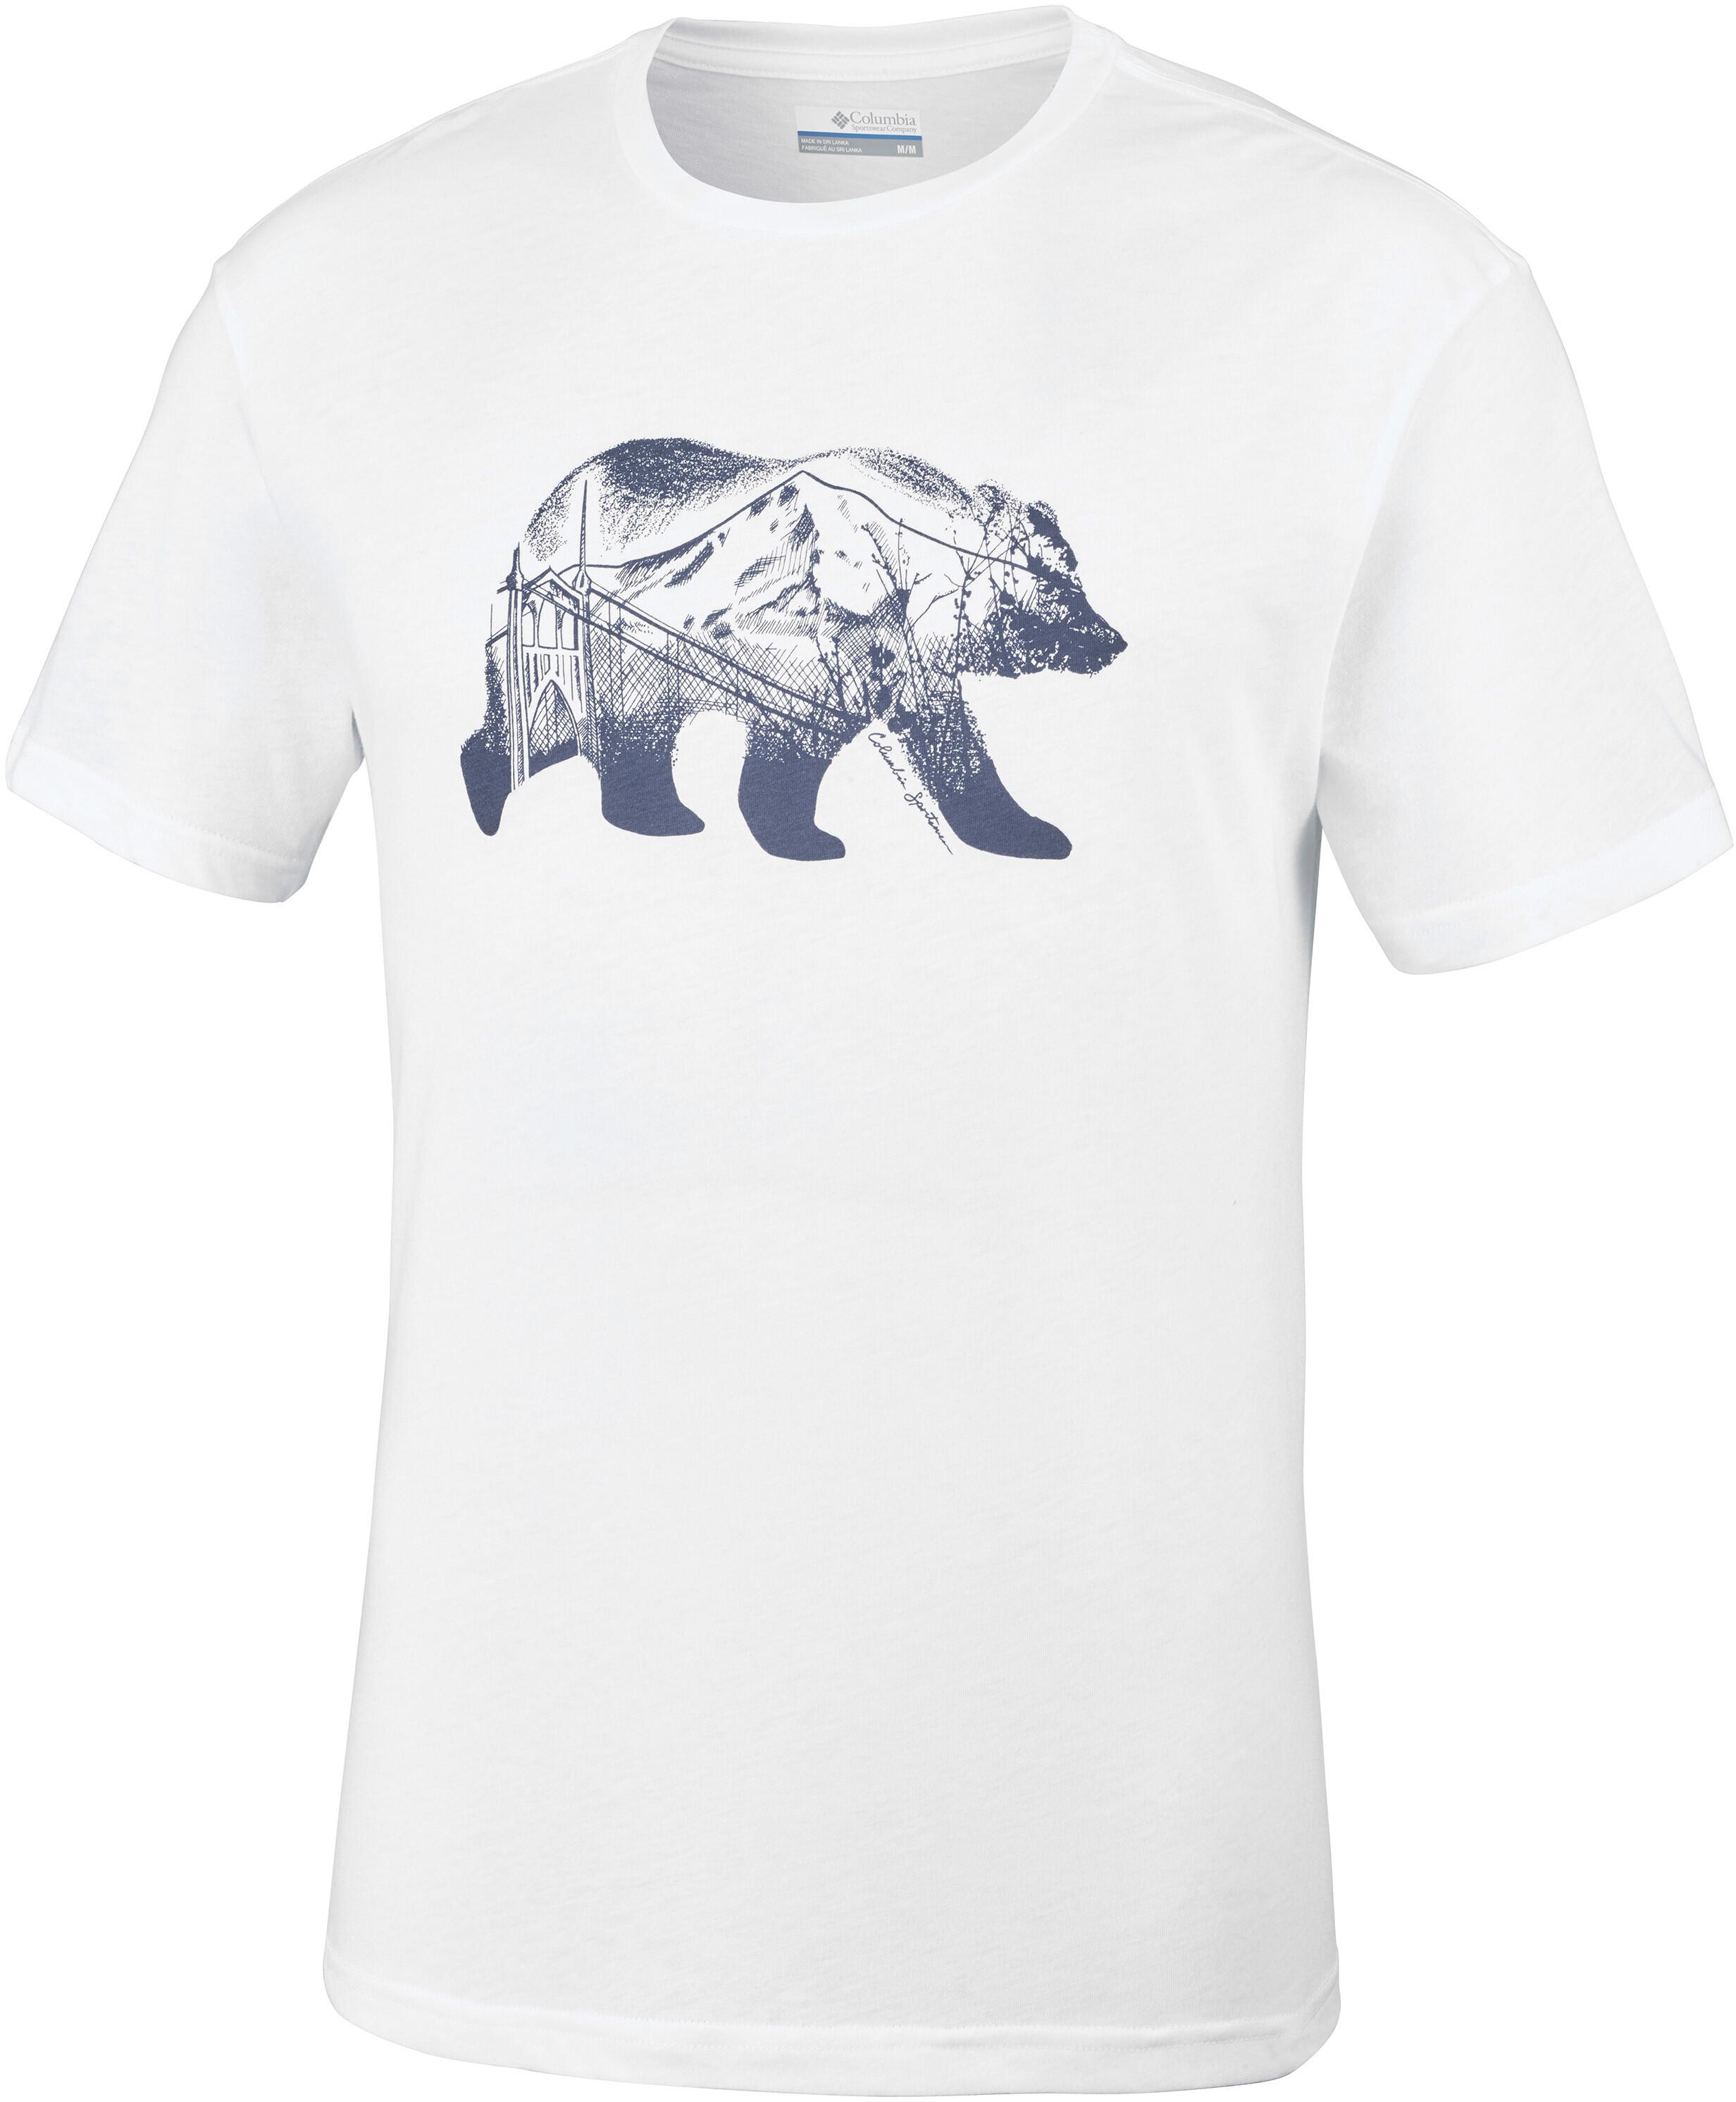 4a12e95c233c7 Columbia Baker Brook - Camiseta manga corta Hombre - blanco